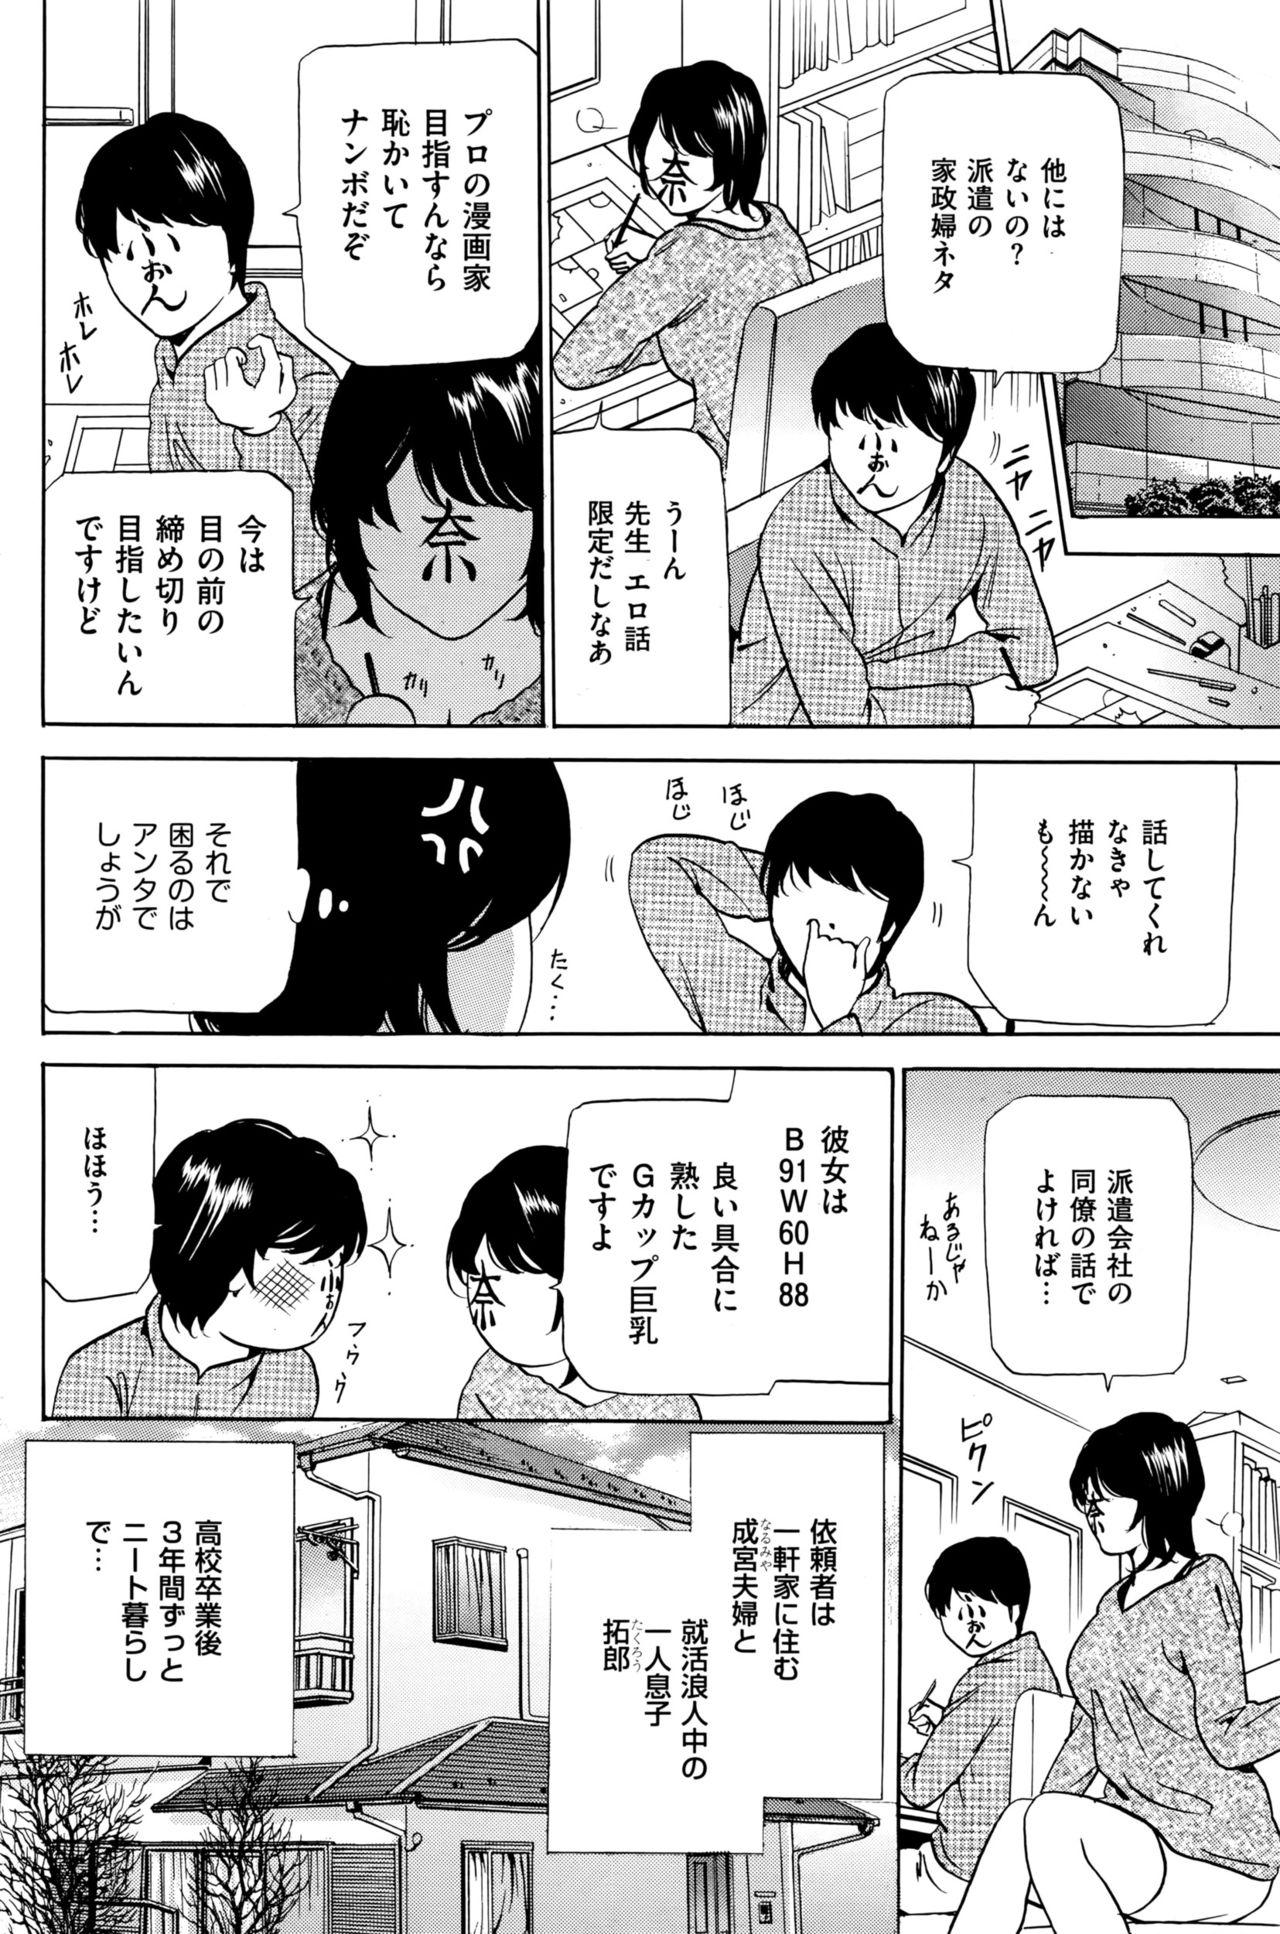 Wa Usuki Ipa a 1-10 20